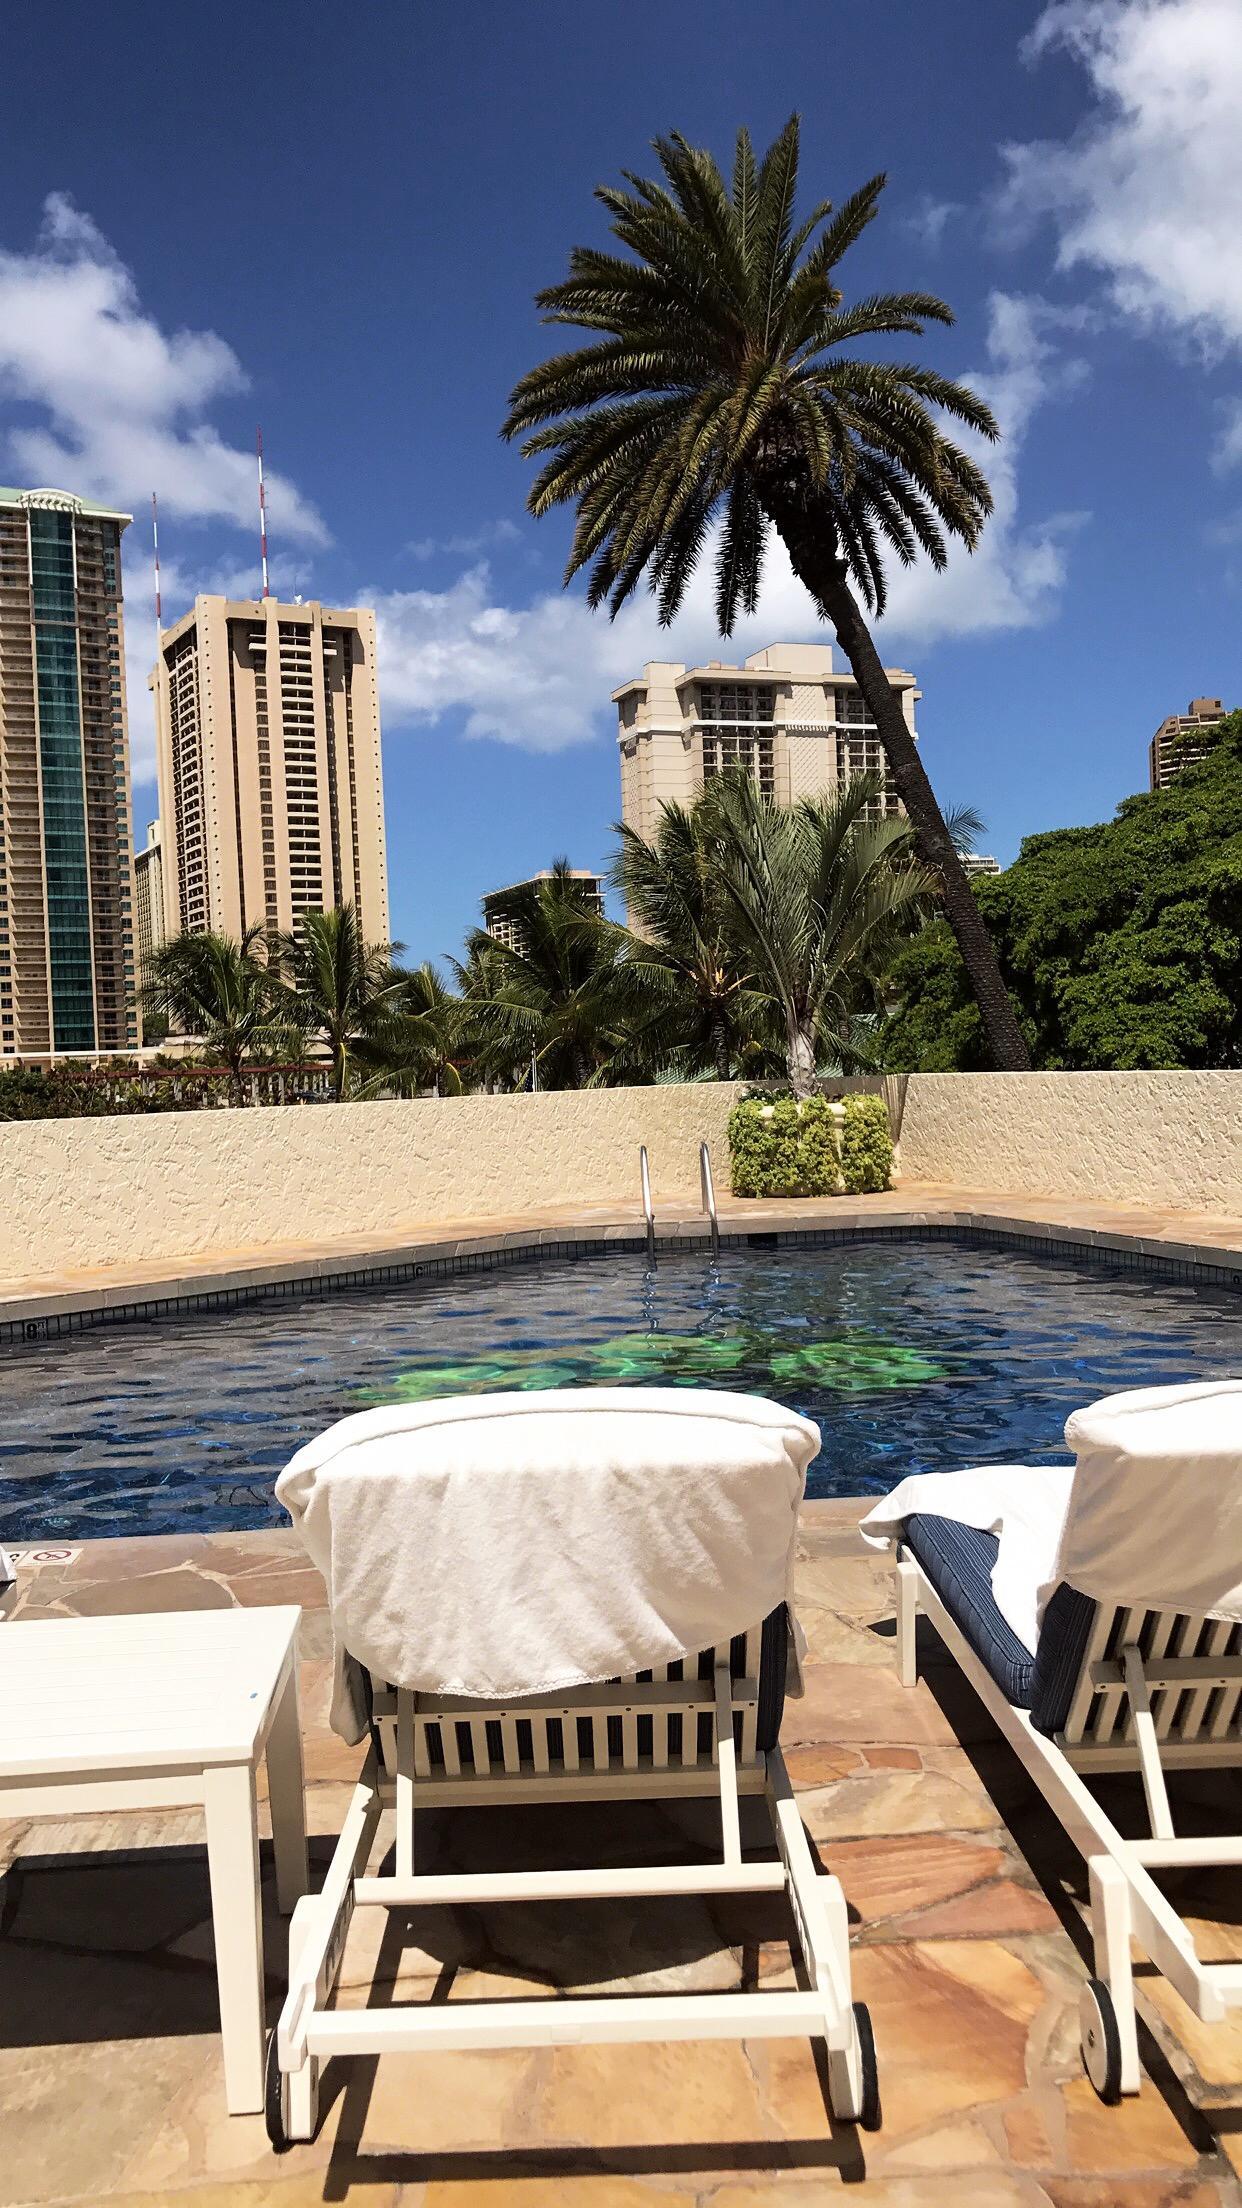 Luana's pool side 👍🏻